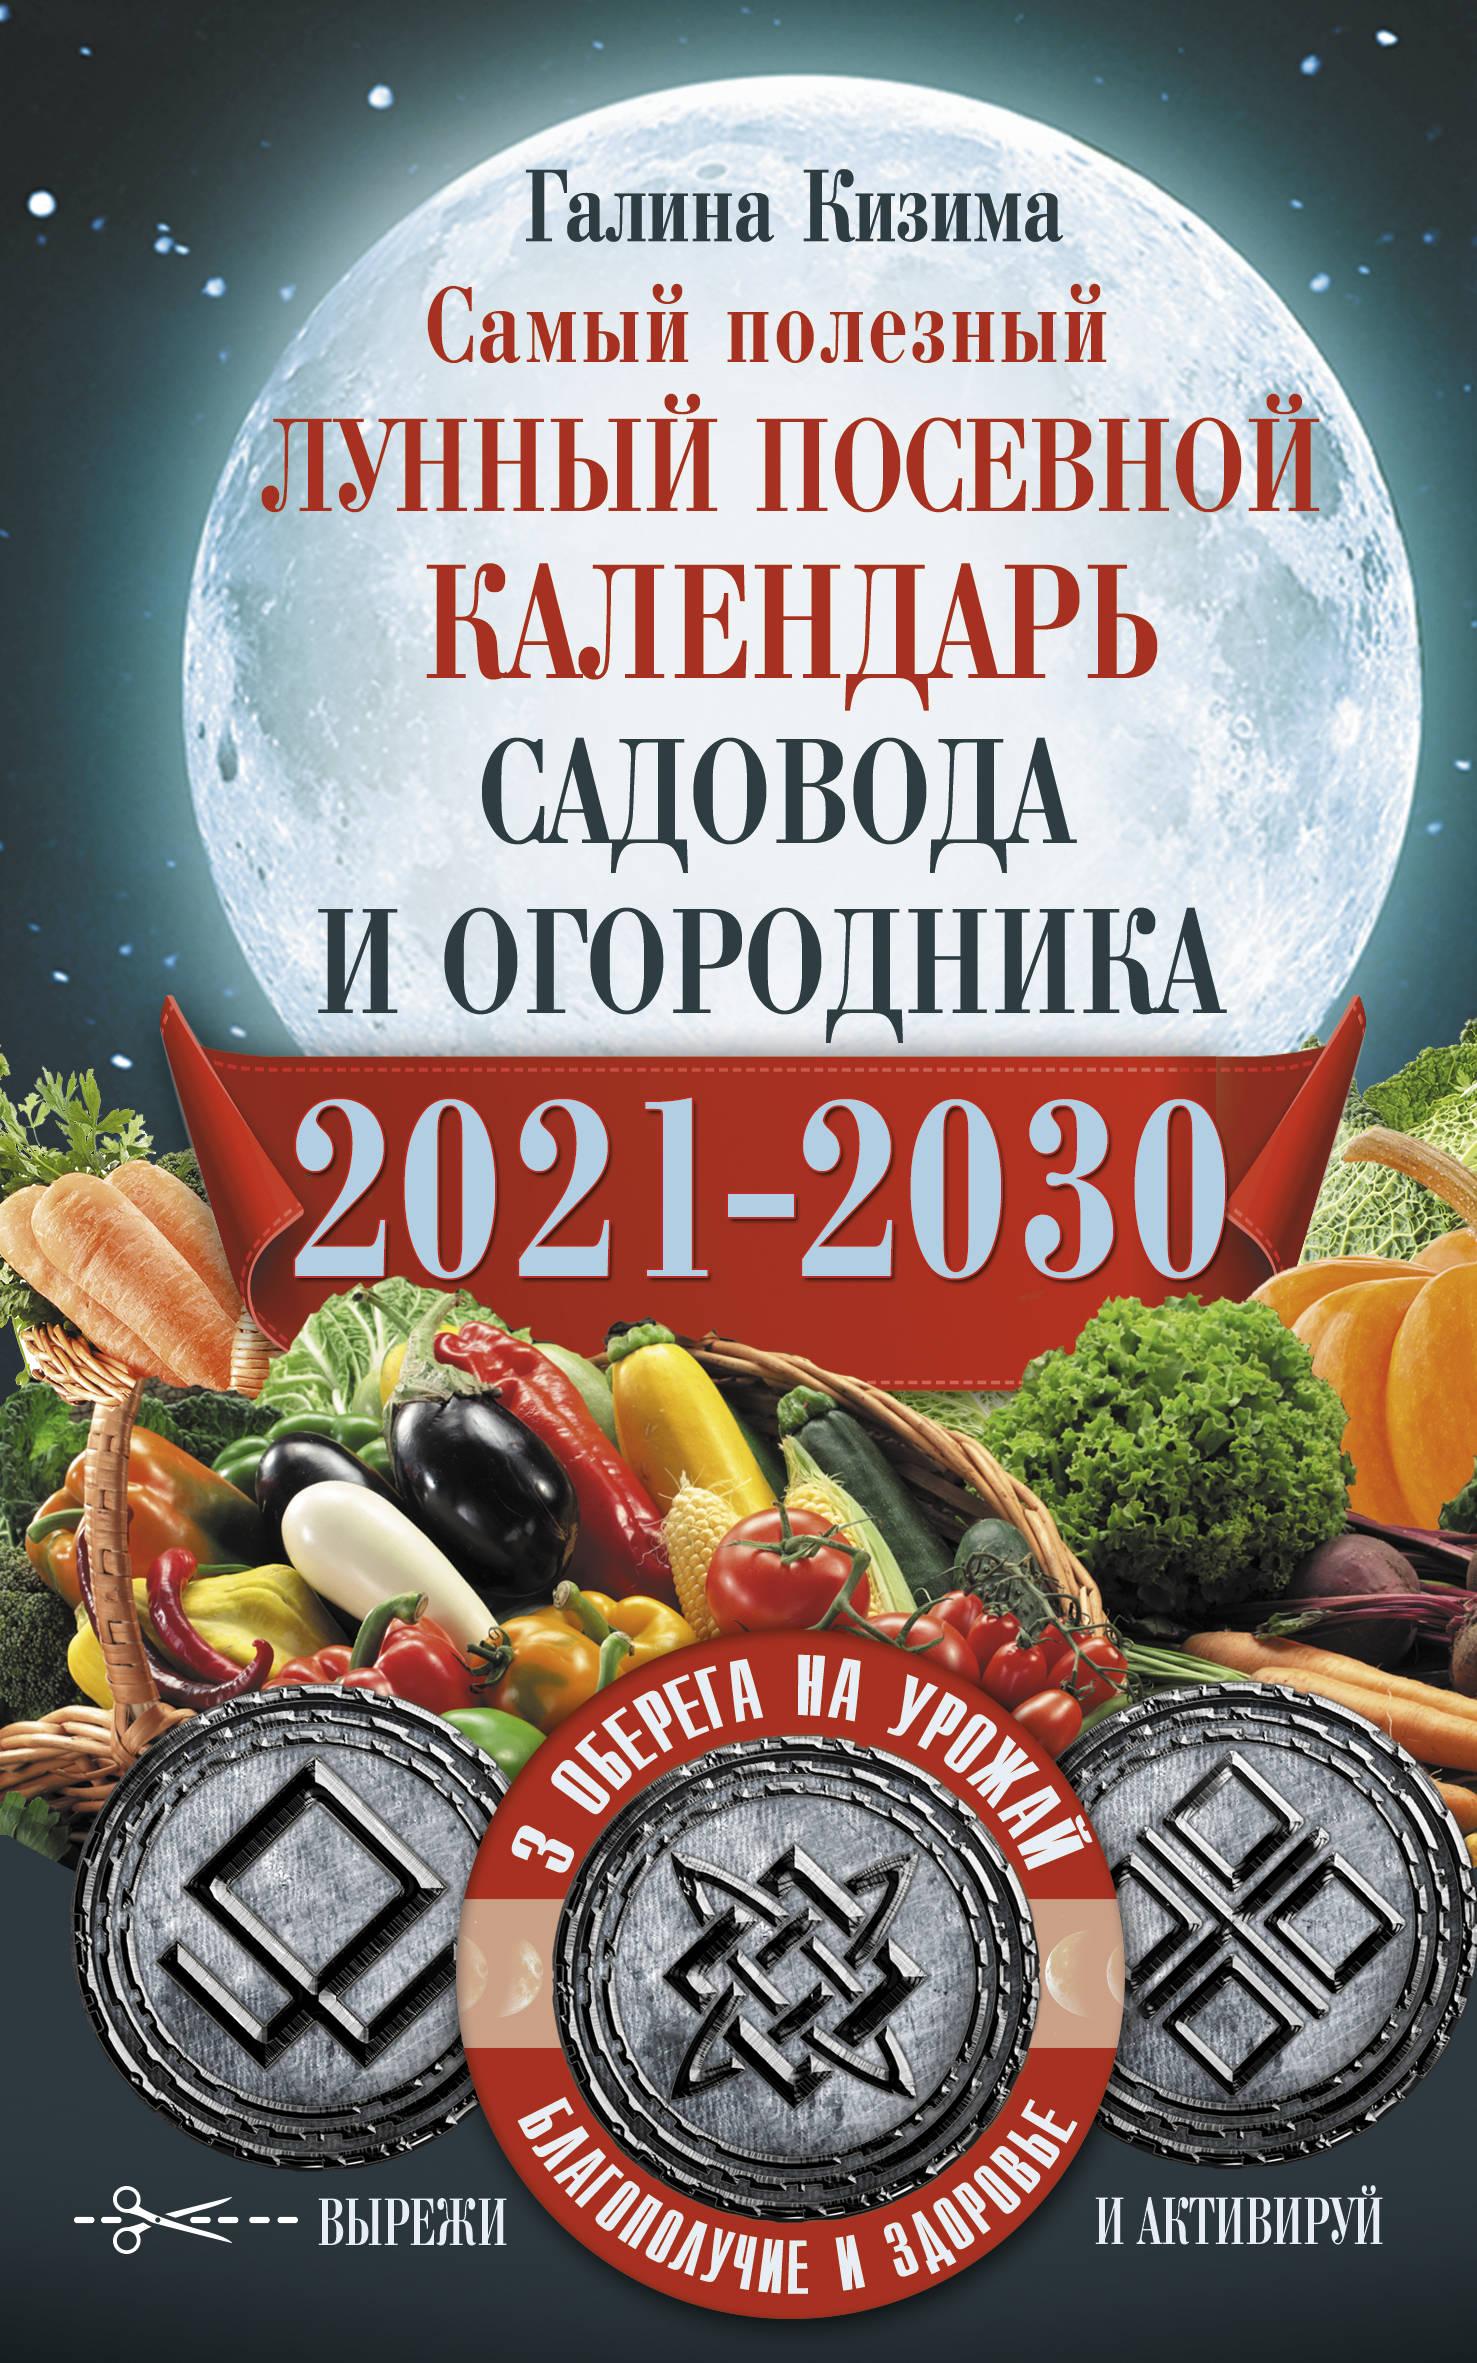 Samyj poleznyj lunnyj posevnoj kalendar sadovoda i ogorodnika na 2021-2030 gg. S oberegami na urozhaj, blagopoluchie doma i zdorovja